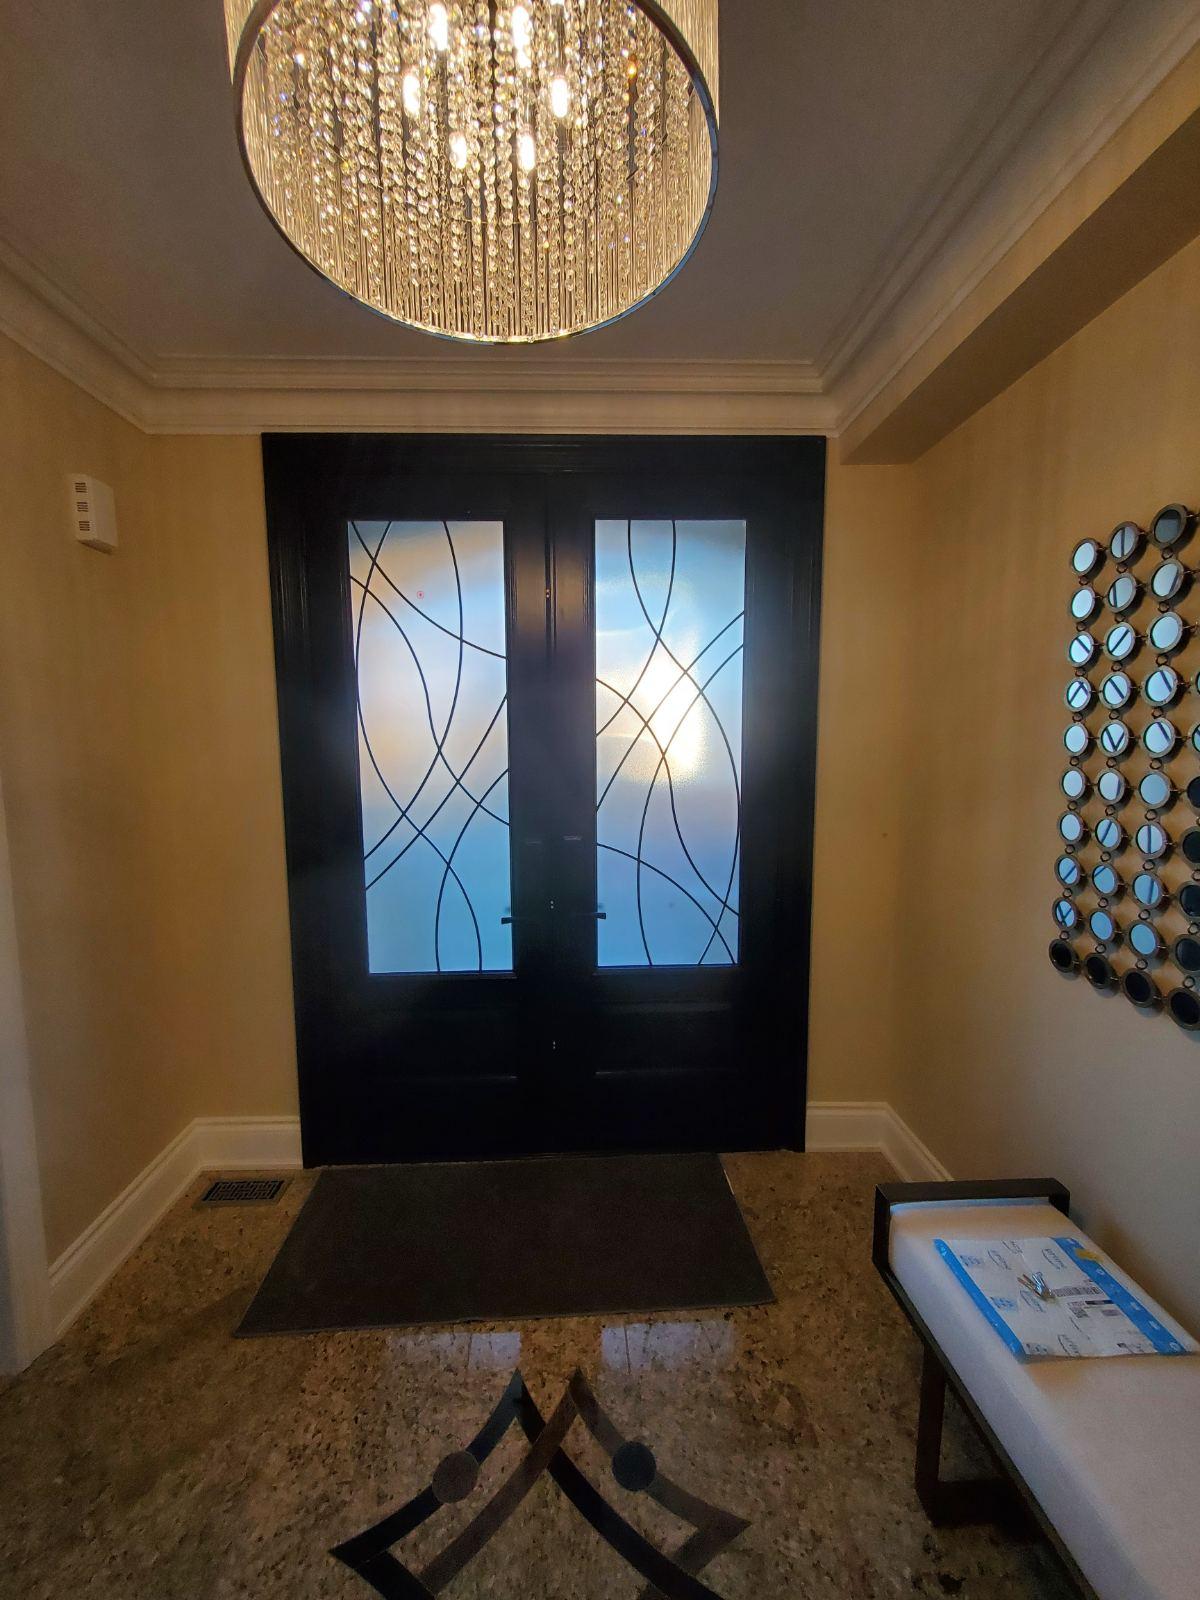 Modern Fiberglass and Steel Door Installation and Replacement, PVC Windows Woodbridge, Maple, Vaughan, King, Aurora, Nemwarket, Caledon, Nobleton, Kleinburg, Mississauga